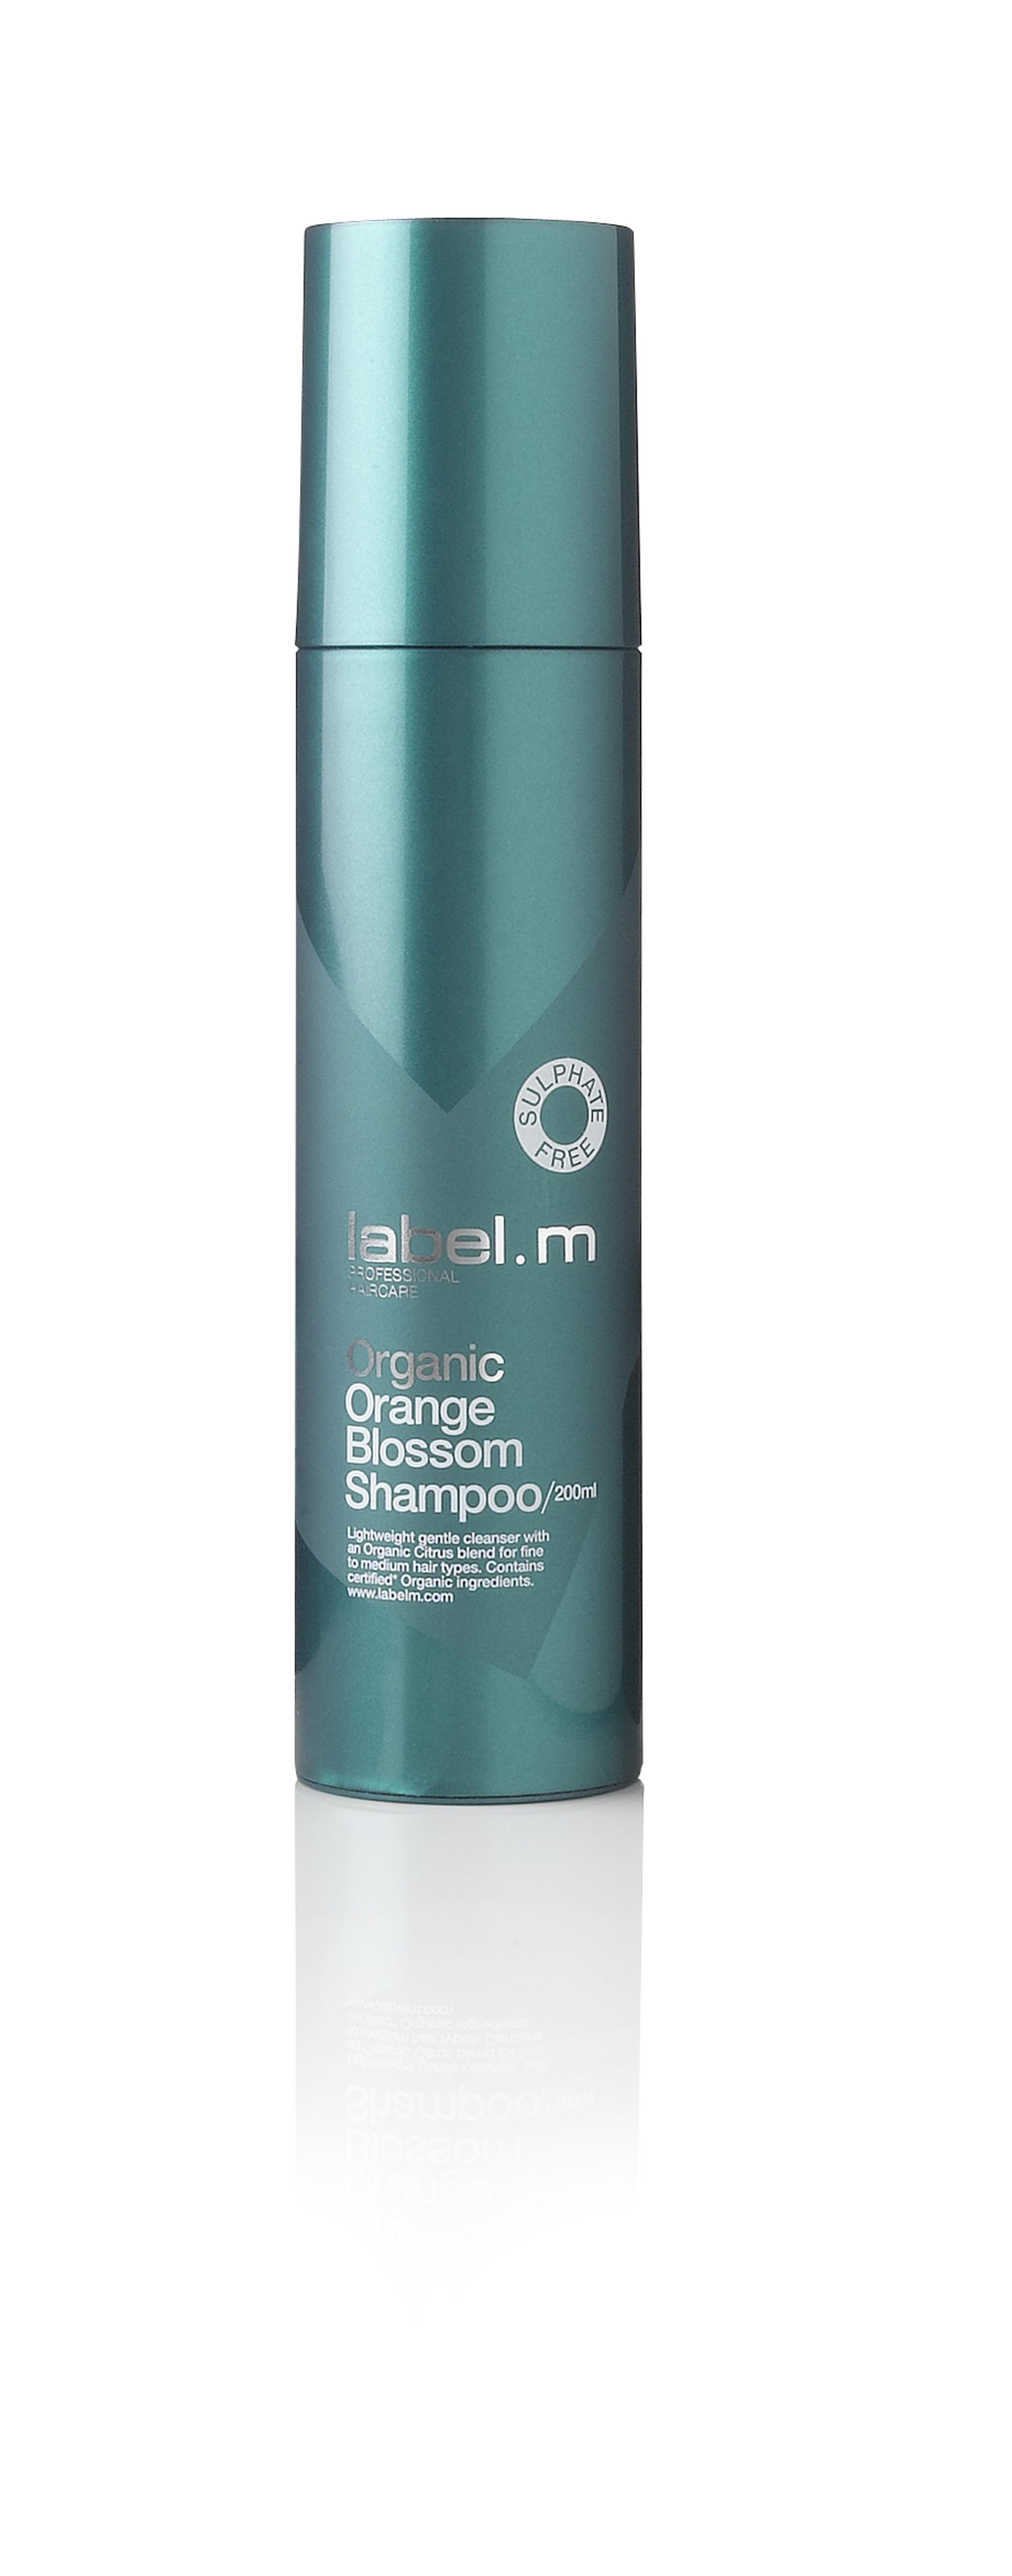 Organic Orange Blossom Shampoo 200ml